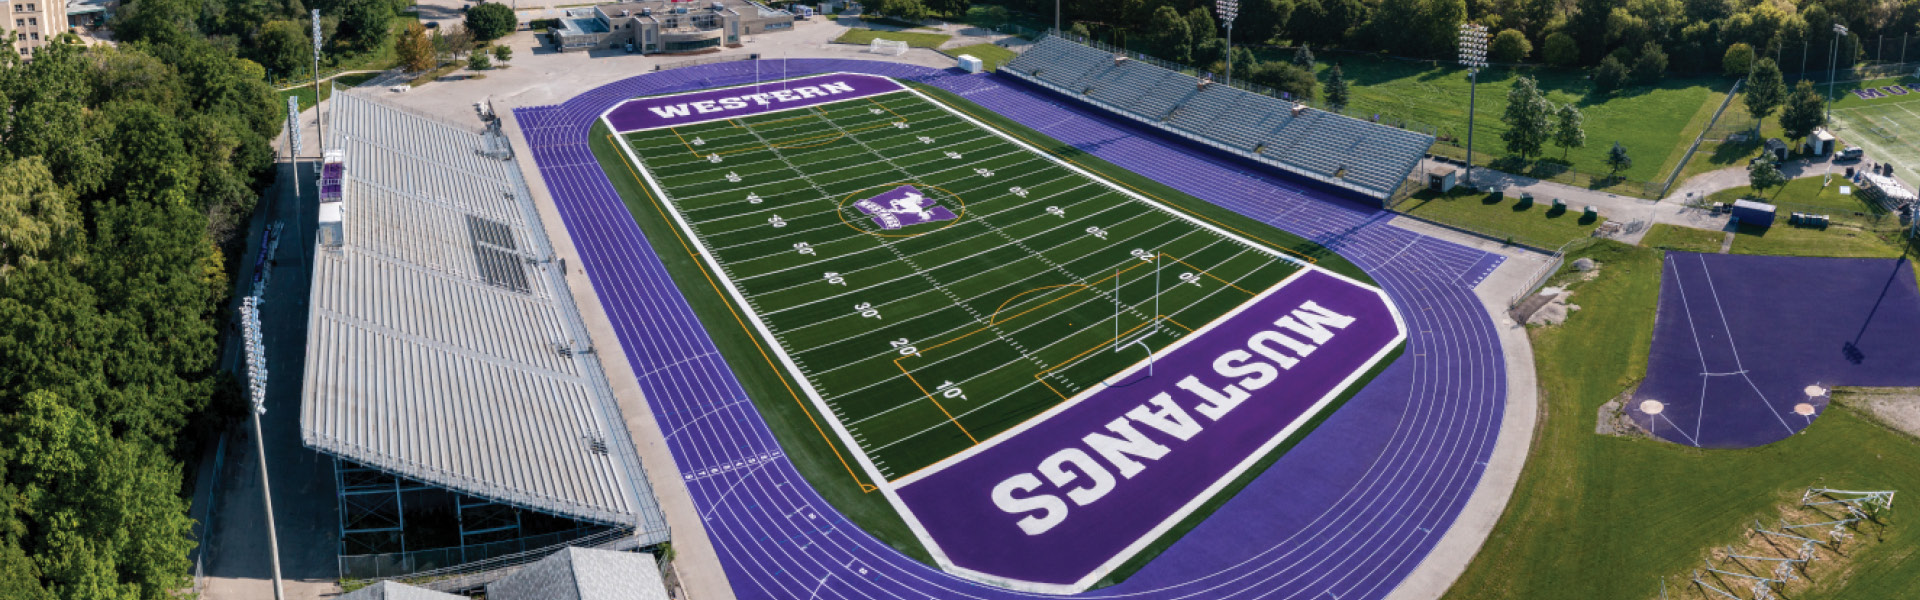 Birds eye view of football field